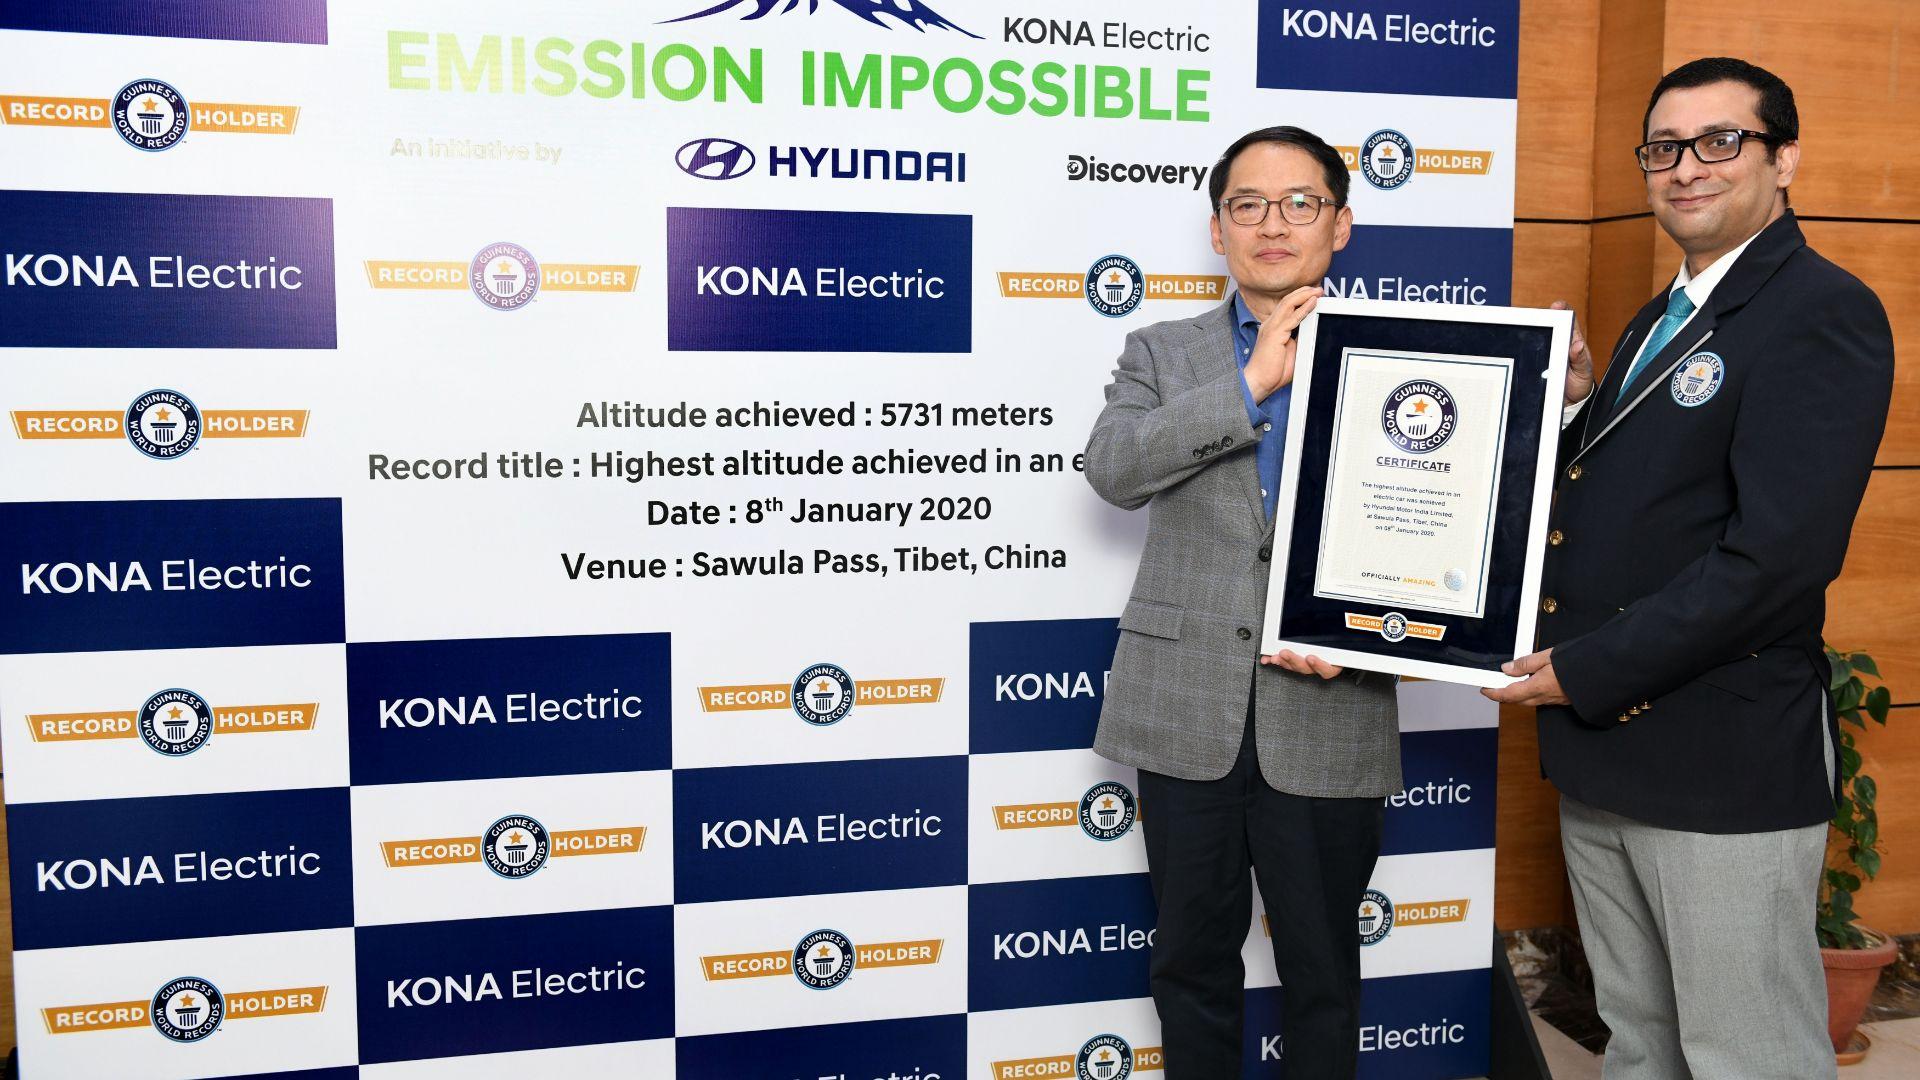 Hyundai Kona EV altitude record